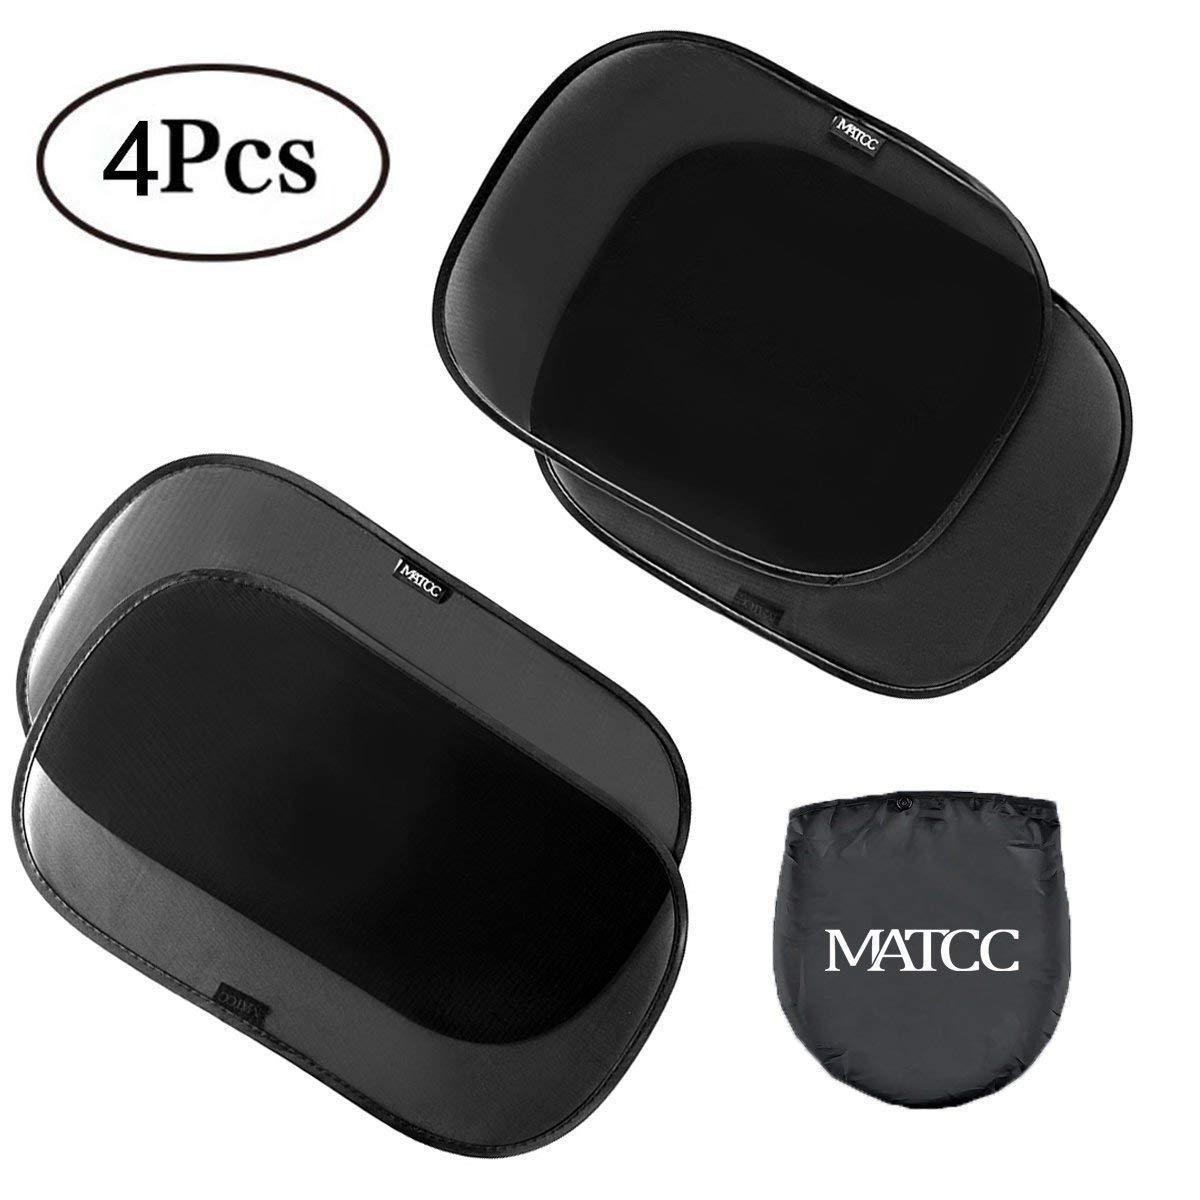 MATCC Auto Rückenlehnenschutz 2 Stück Auto Kinder Organizer mit iPad Tablet Tasche Wasserfester Rücksitzschoner Trittschutz Anhängematte Kick-Matten-Schutz Tablet Halterung (65 * 48cm) MATCCwoitxol213